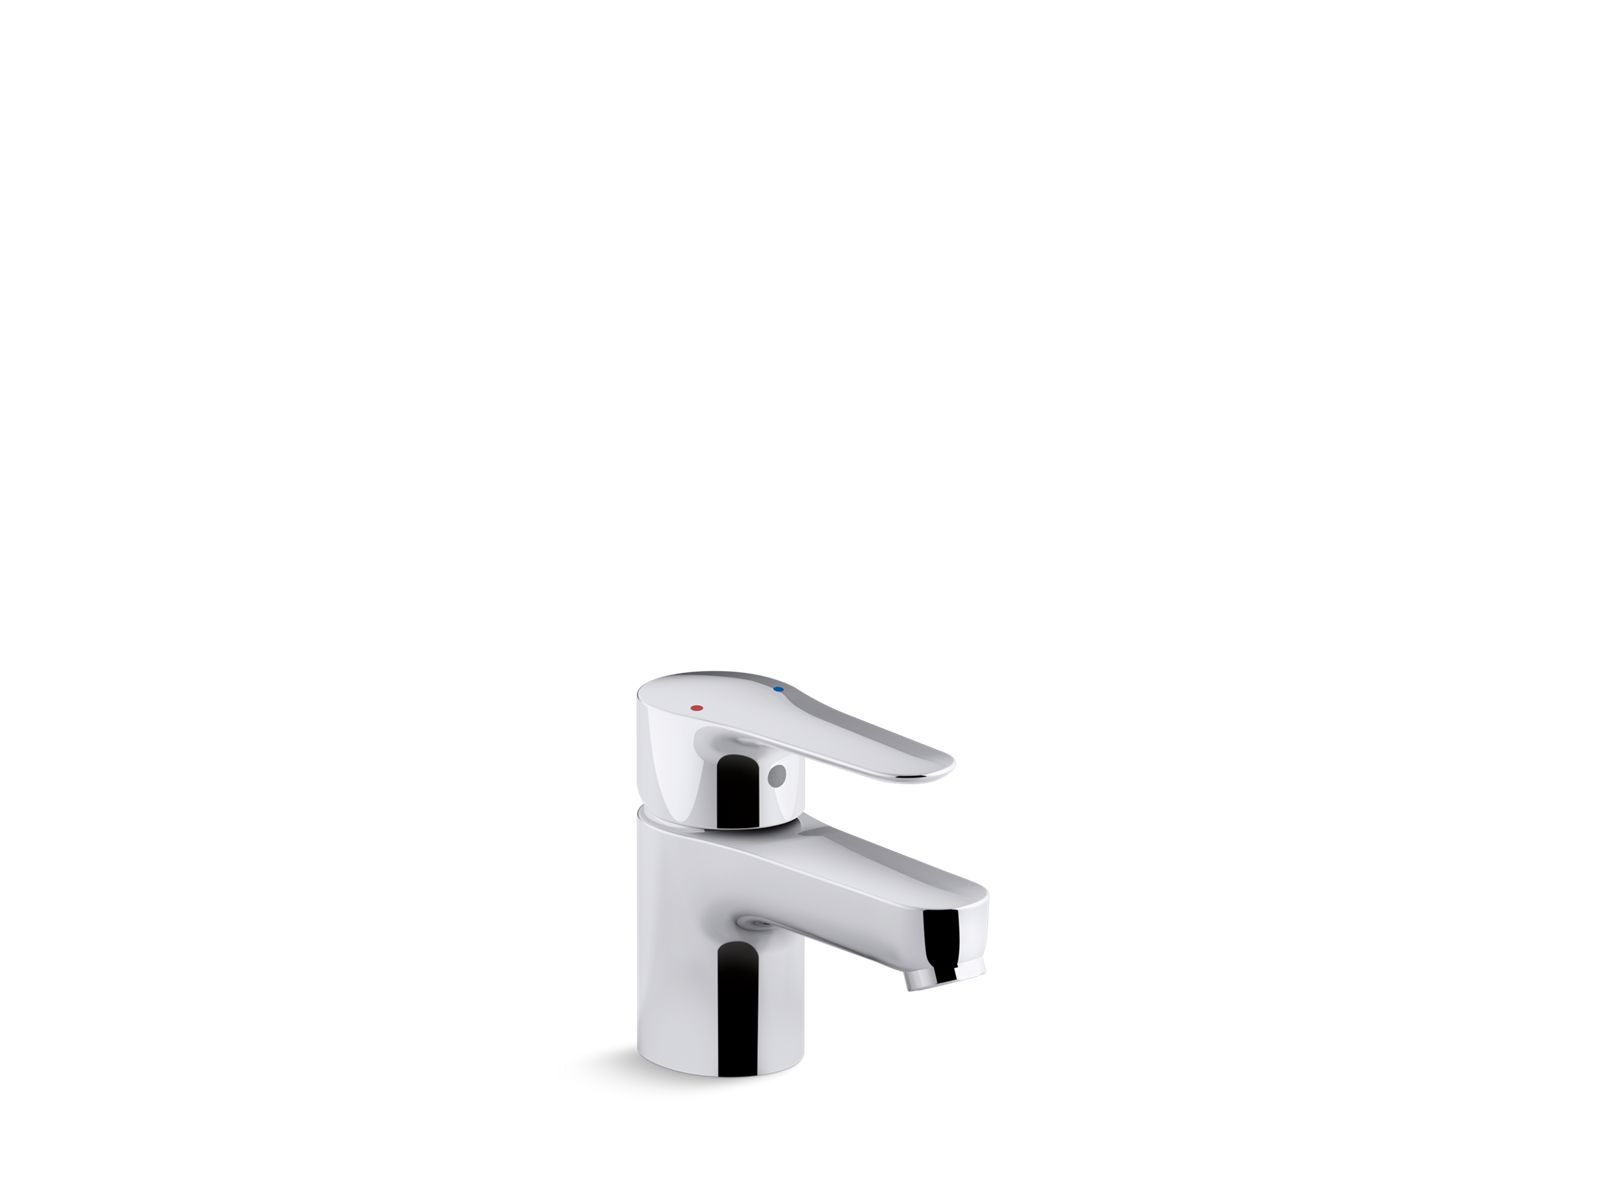 July Single-Handle Bathroom Sink Faucet | K-16027-4 | KOHLER ...